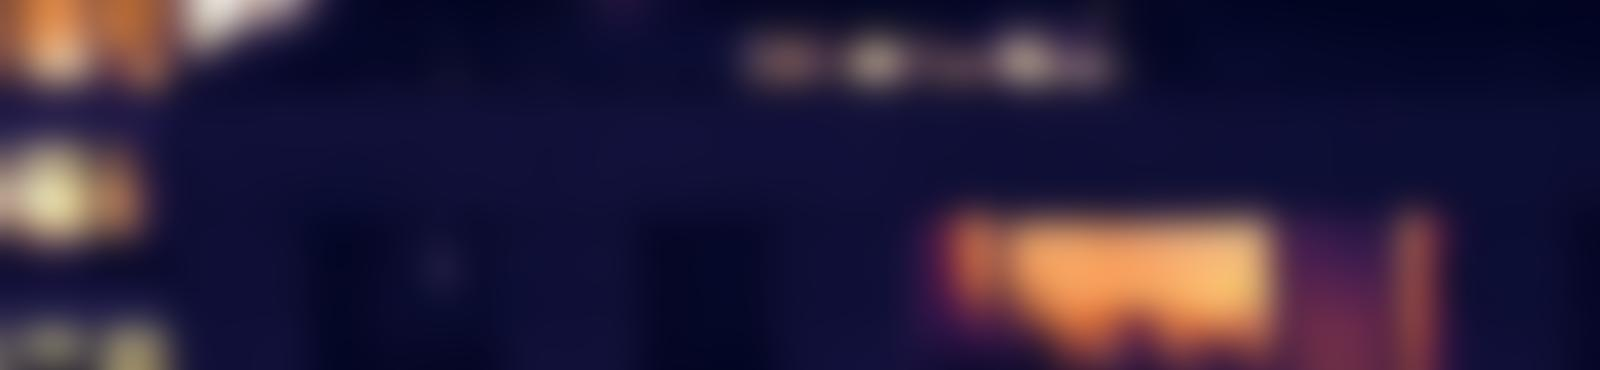 Blurred e352f34c f1e7 4011 8d92 26fa5d8c585e